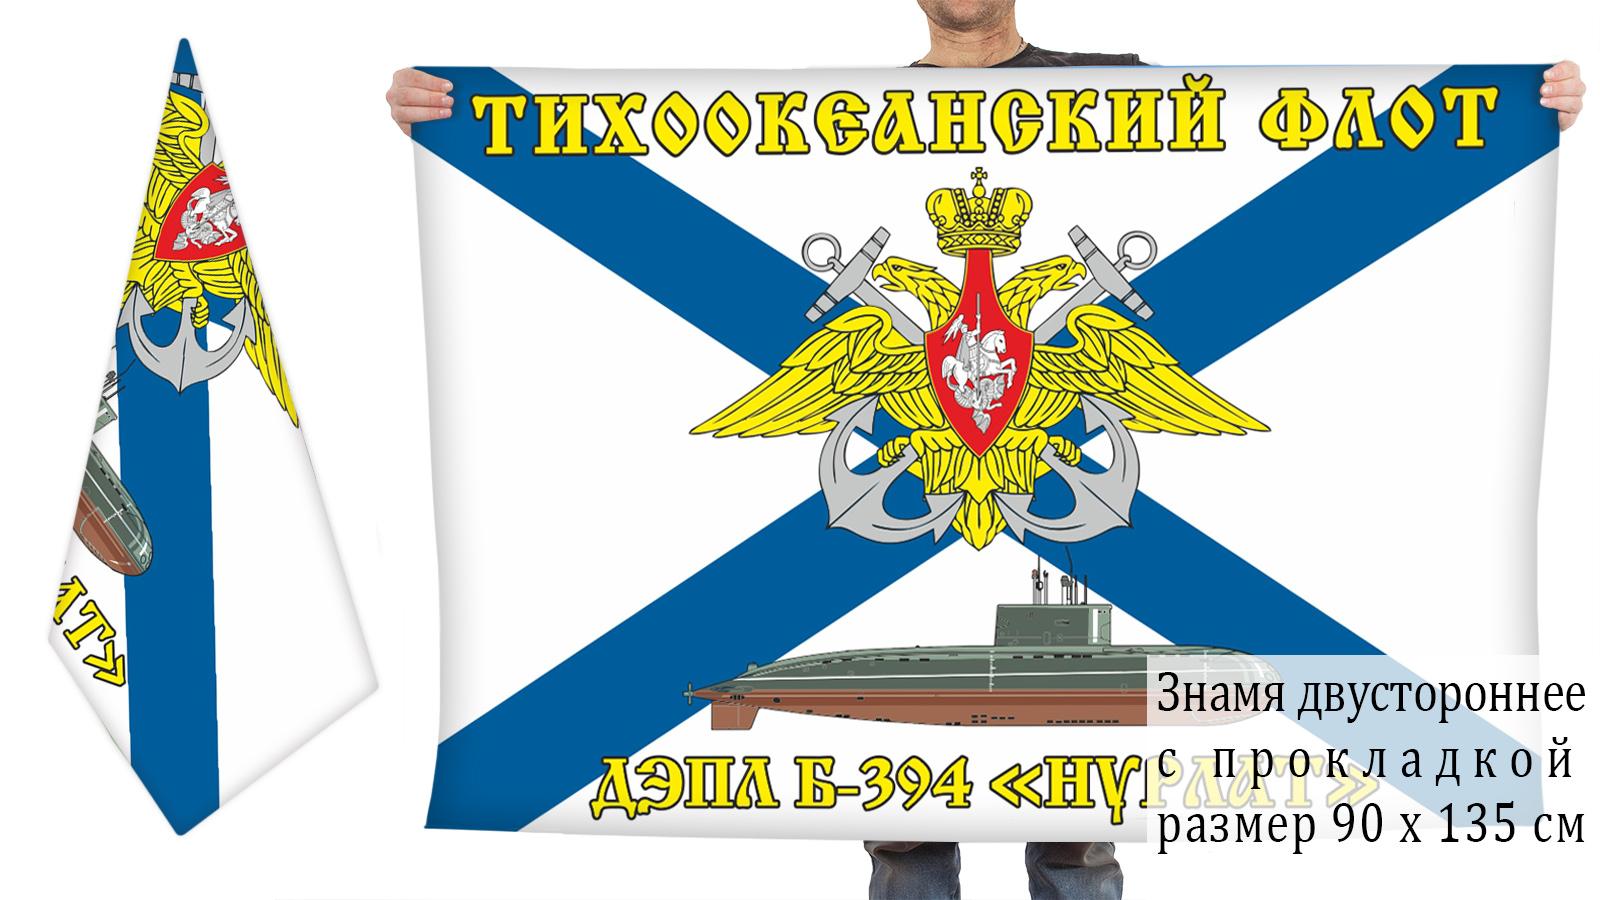 Заказать двухсторонний флаг Б-394 Нурлат